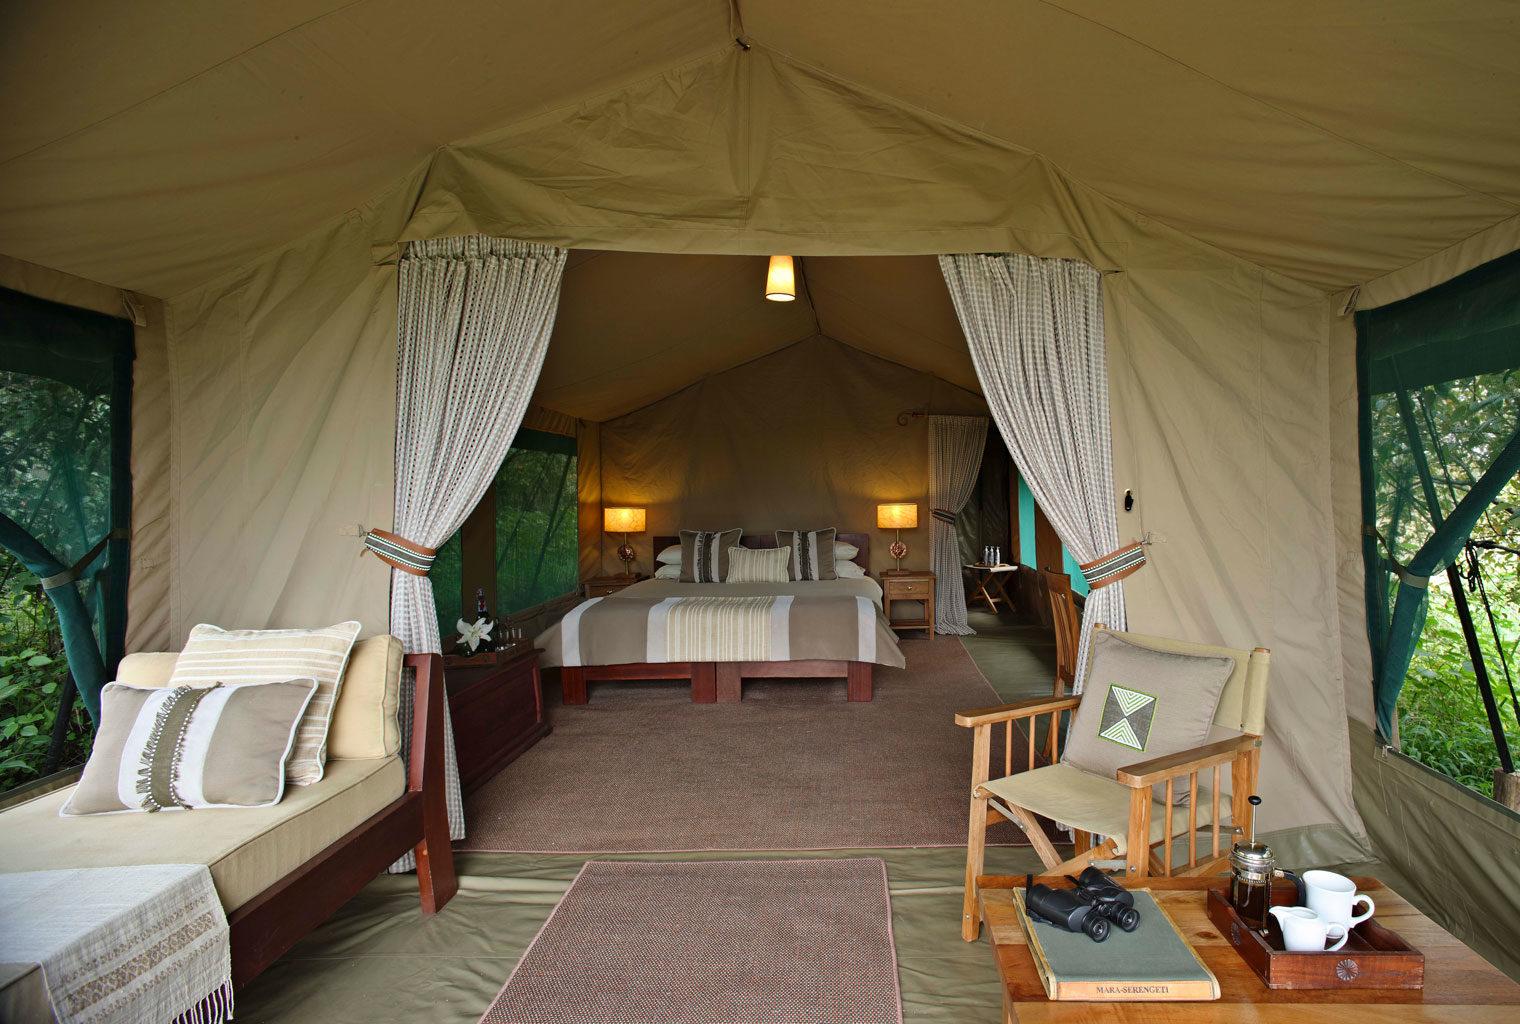 Rekero-Camp-guest-tent-interior